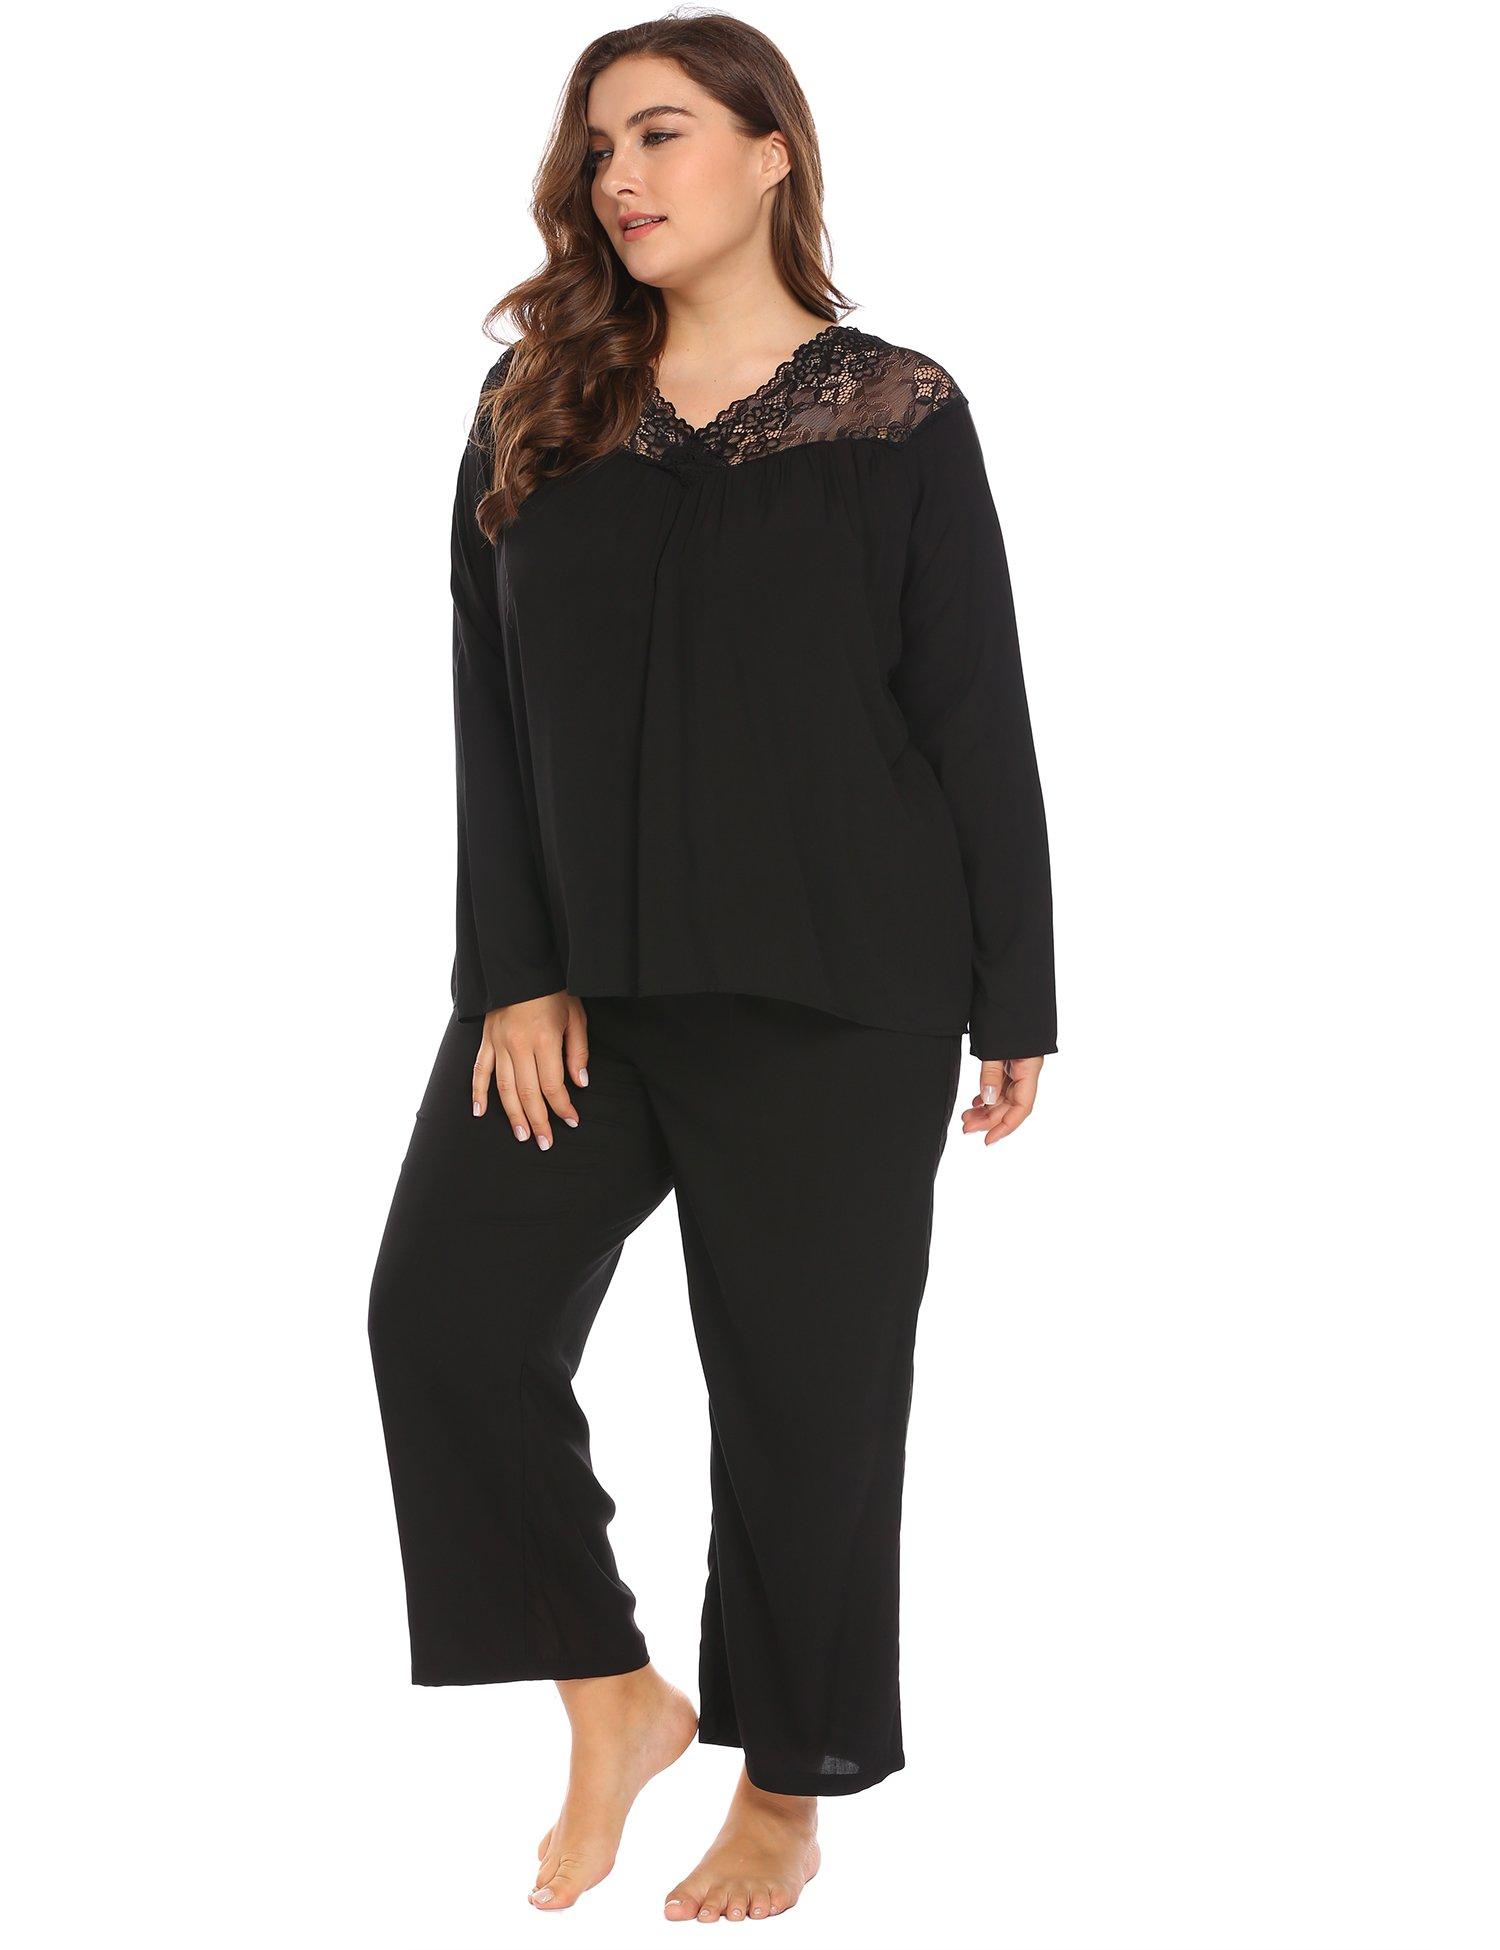 Women's Plus Size Loose Fit V-Neck Long Sleeve Soft Sleepwear Lace Patchwork Tops & Pants Pajama Set